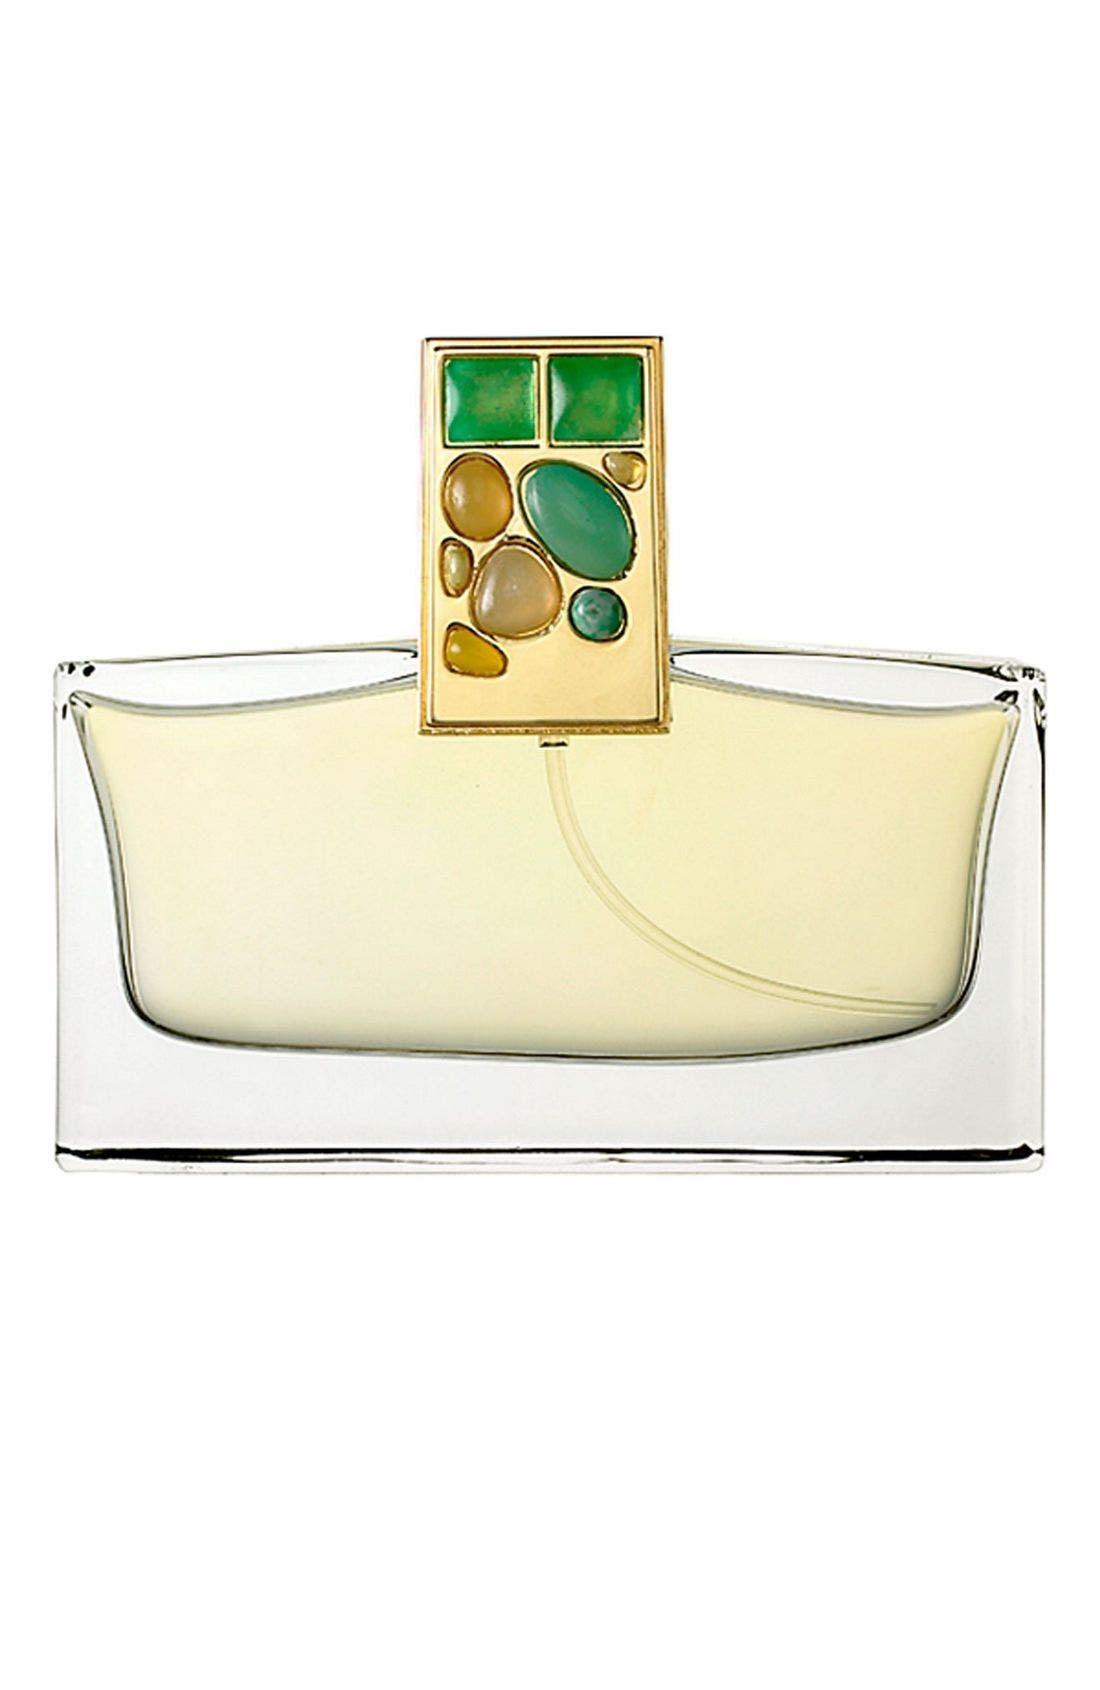 Estée Lauder Private Collection - Tuberose Gardenia Parfum Spray